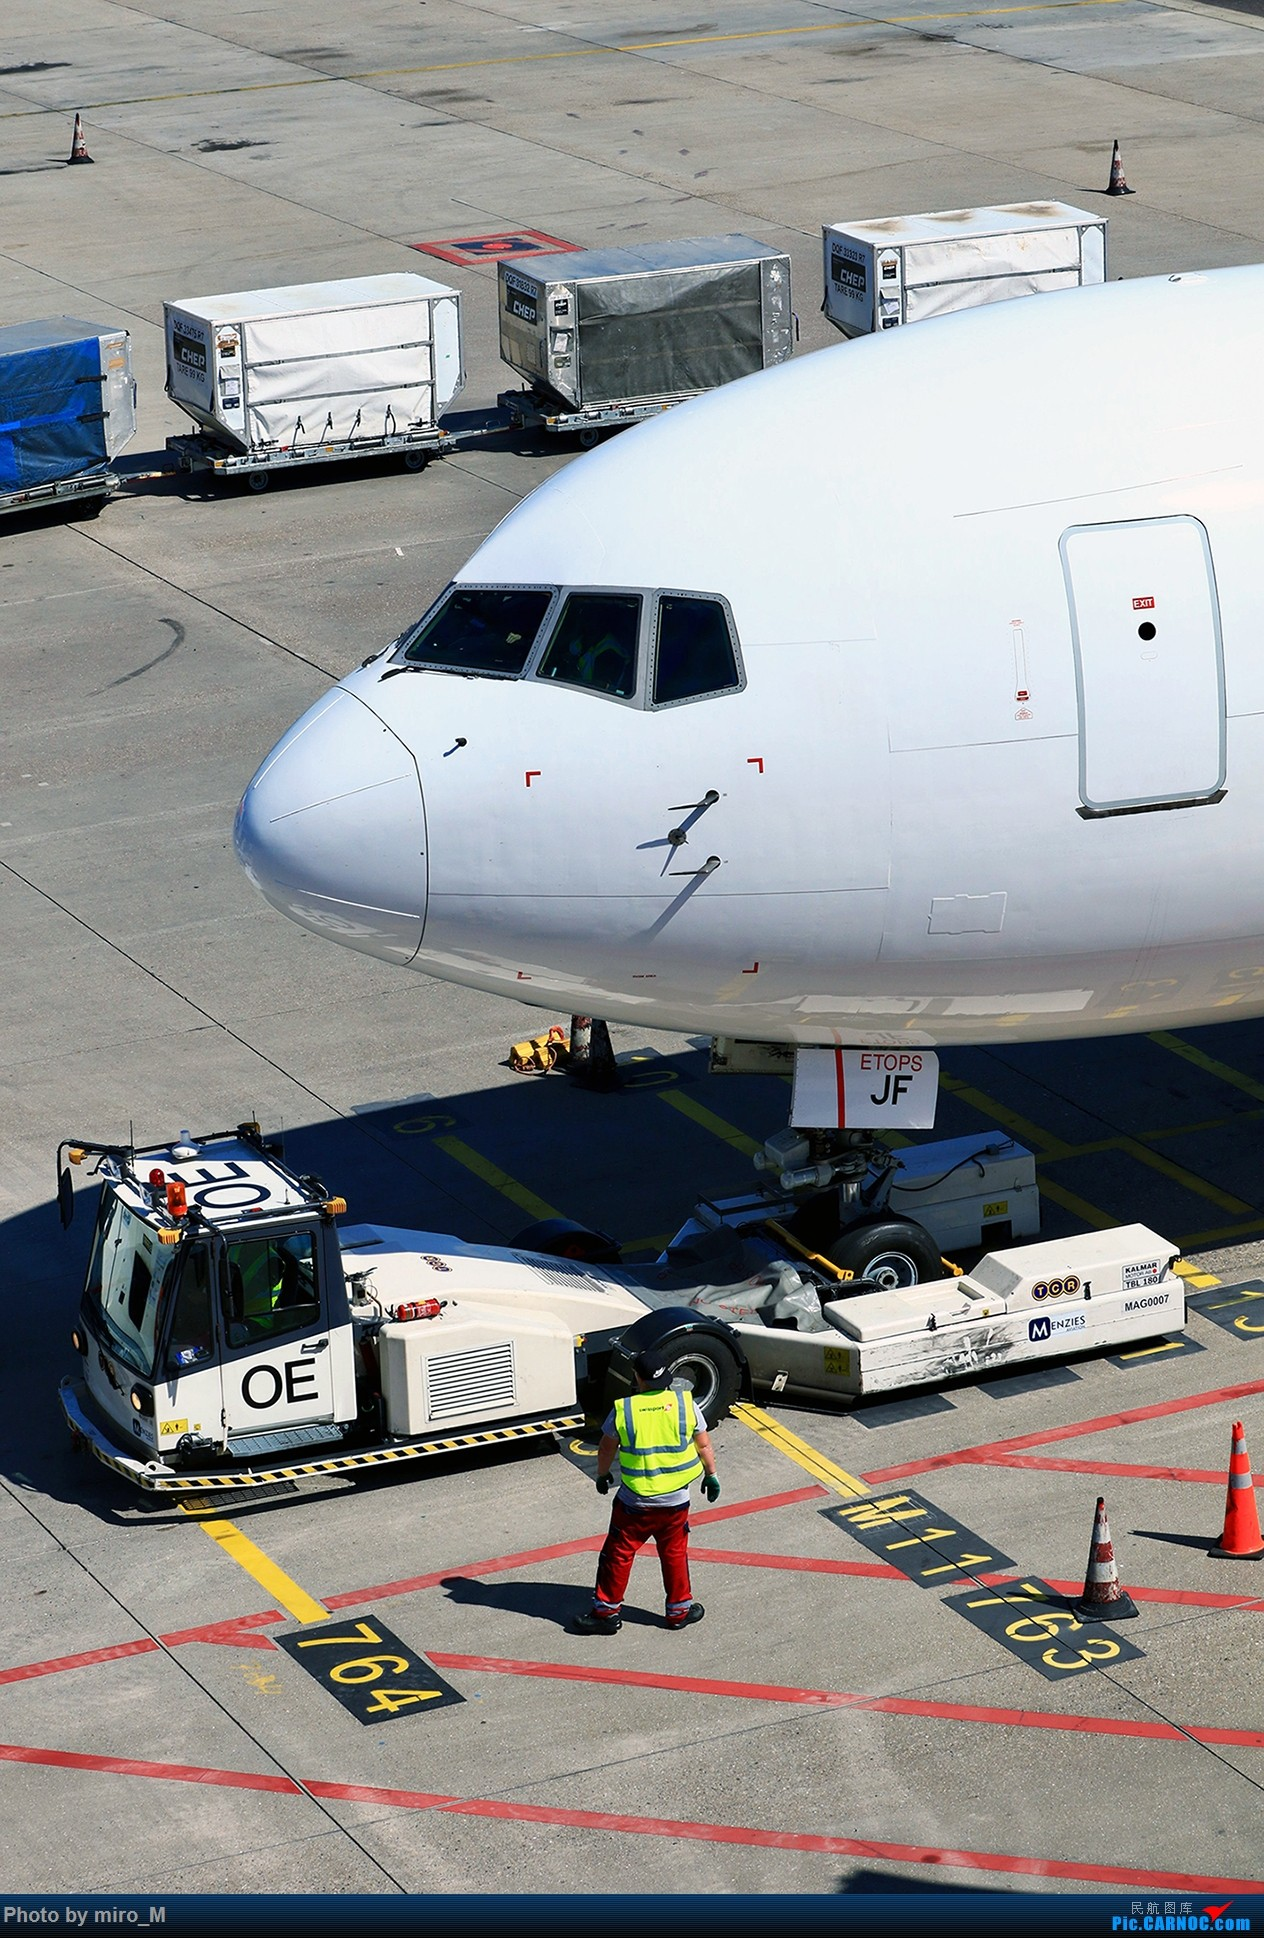 Re:[原创]欧洲浪了一圈,CS100,BAE146,fokker70等新老机型串着飞+ZRH,MUC,FRA,AMS,TLS拍机 BOEING 767-300 HB-JJF AMS